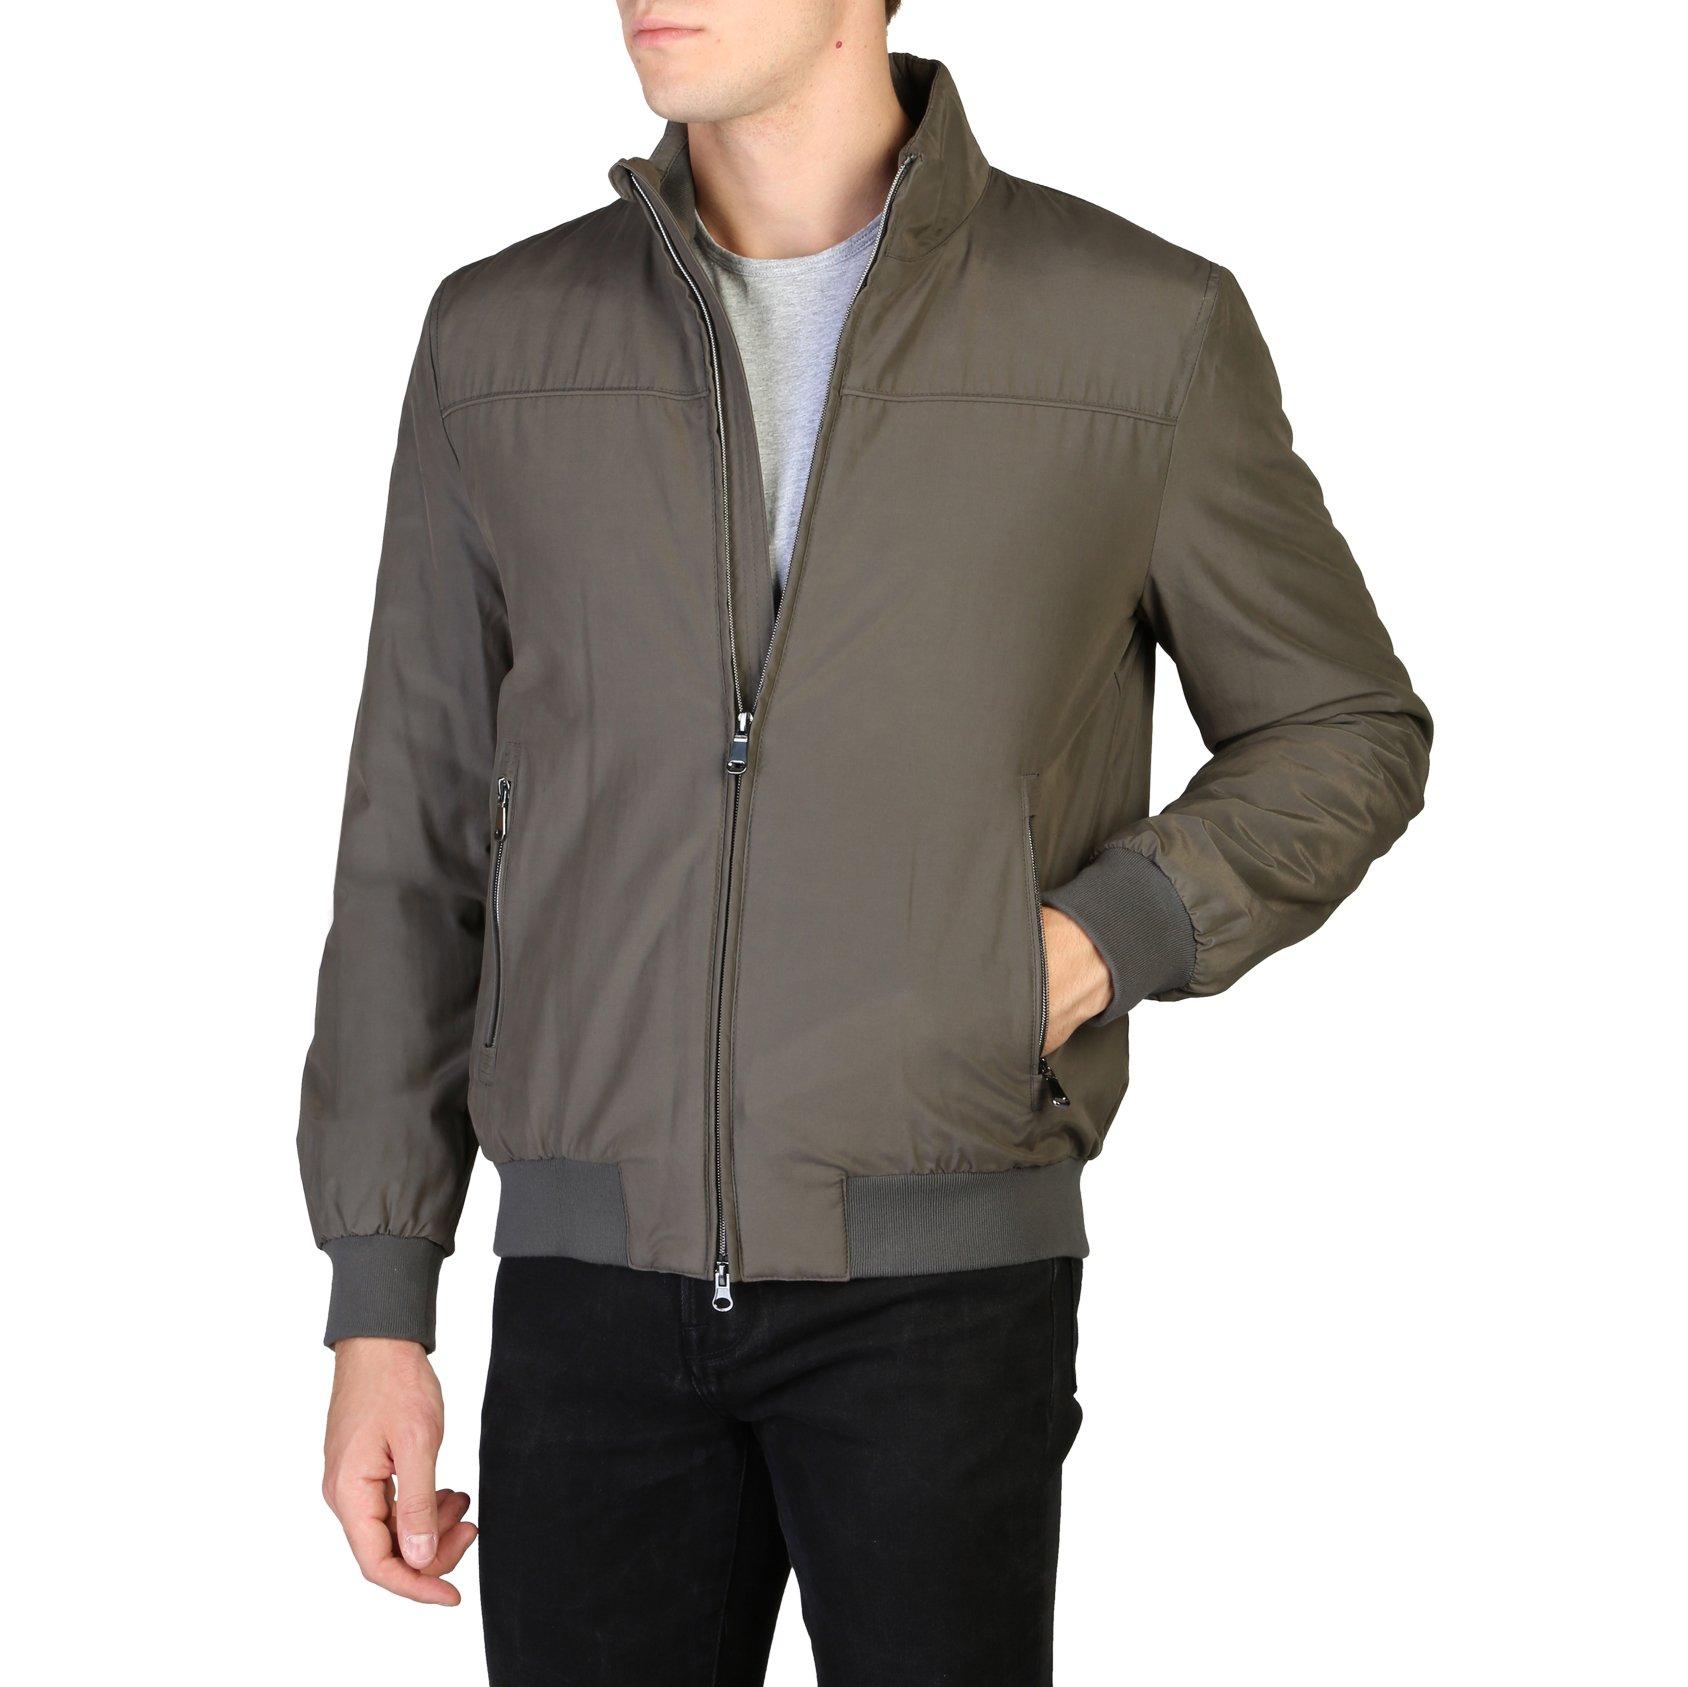 Geox Men's Jacket Brown M8420LT2499 - green 56